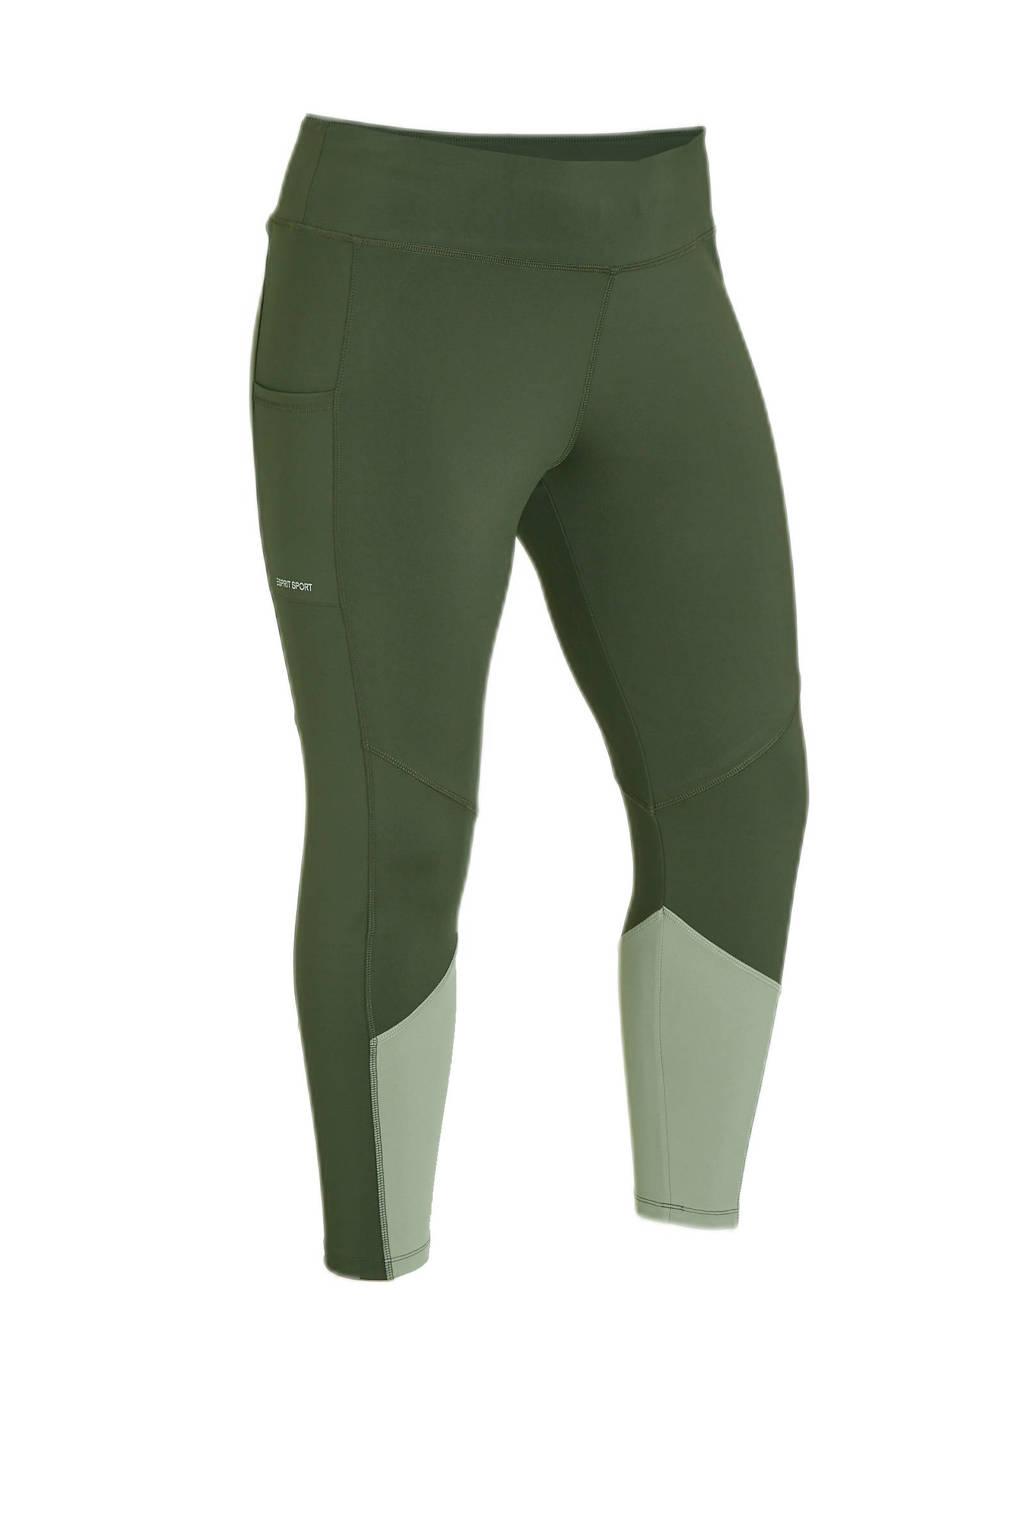 ESPRIT Women Sports Plus Size sportlegging kaki, Groen